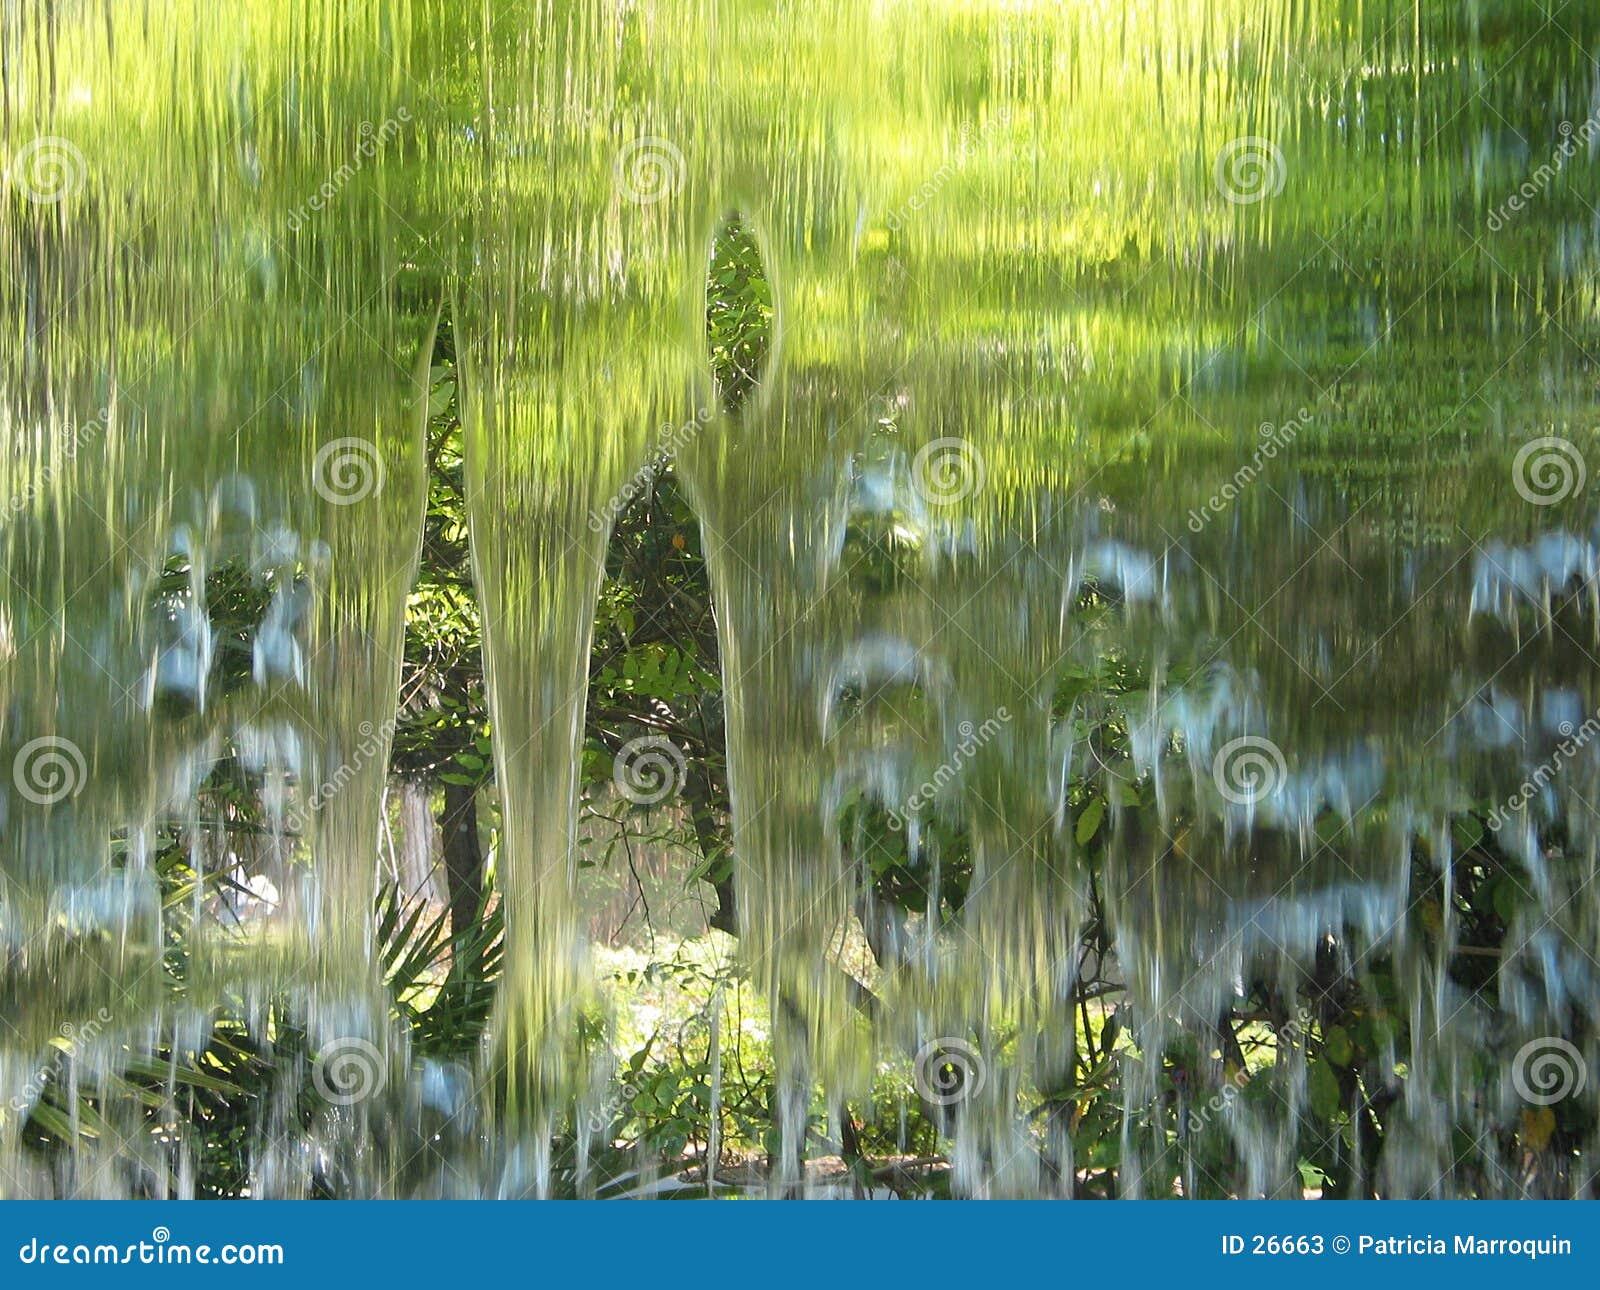 Download Pared de agua imagen de archivo. Imagen de gotas, líquido - 26663